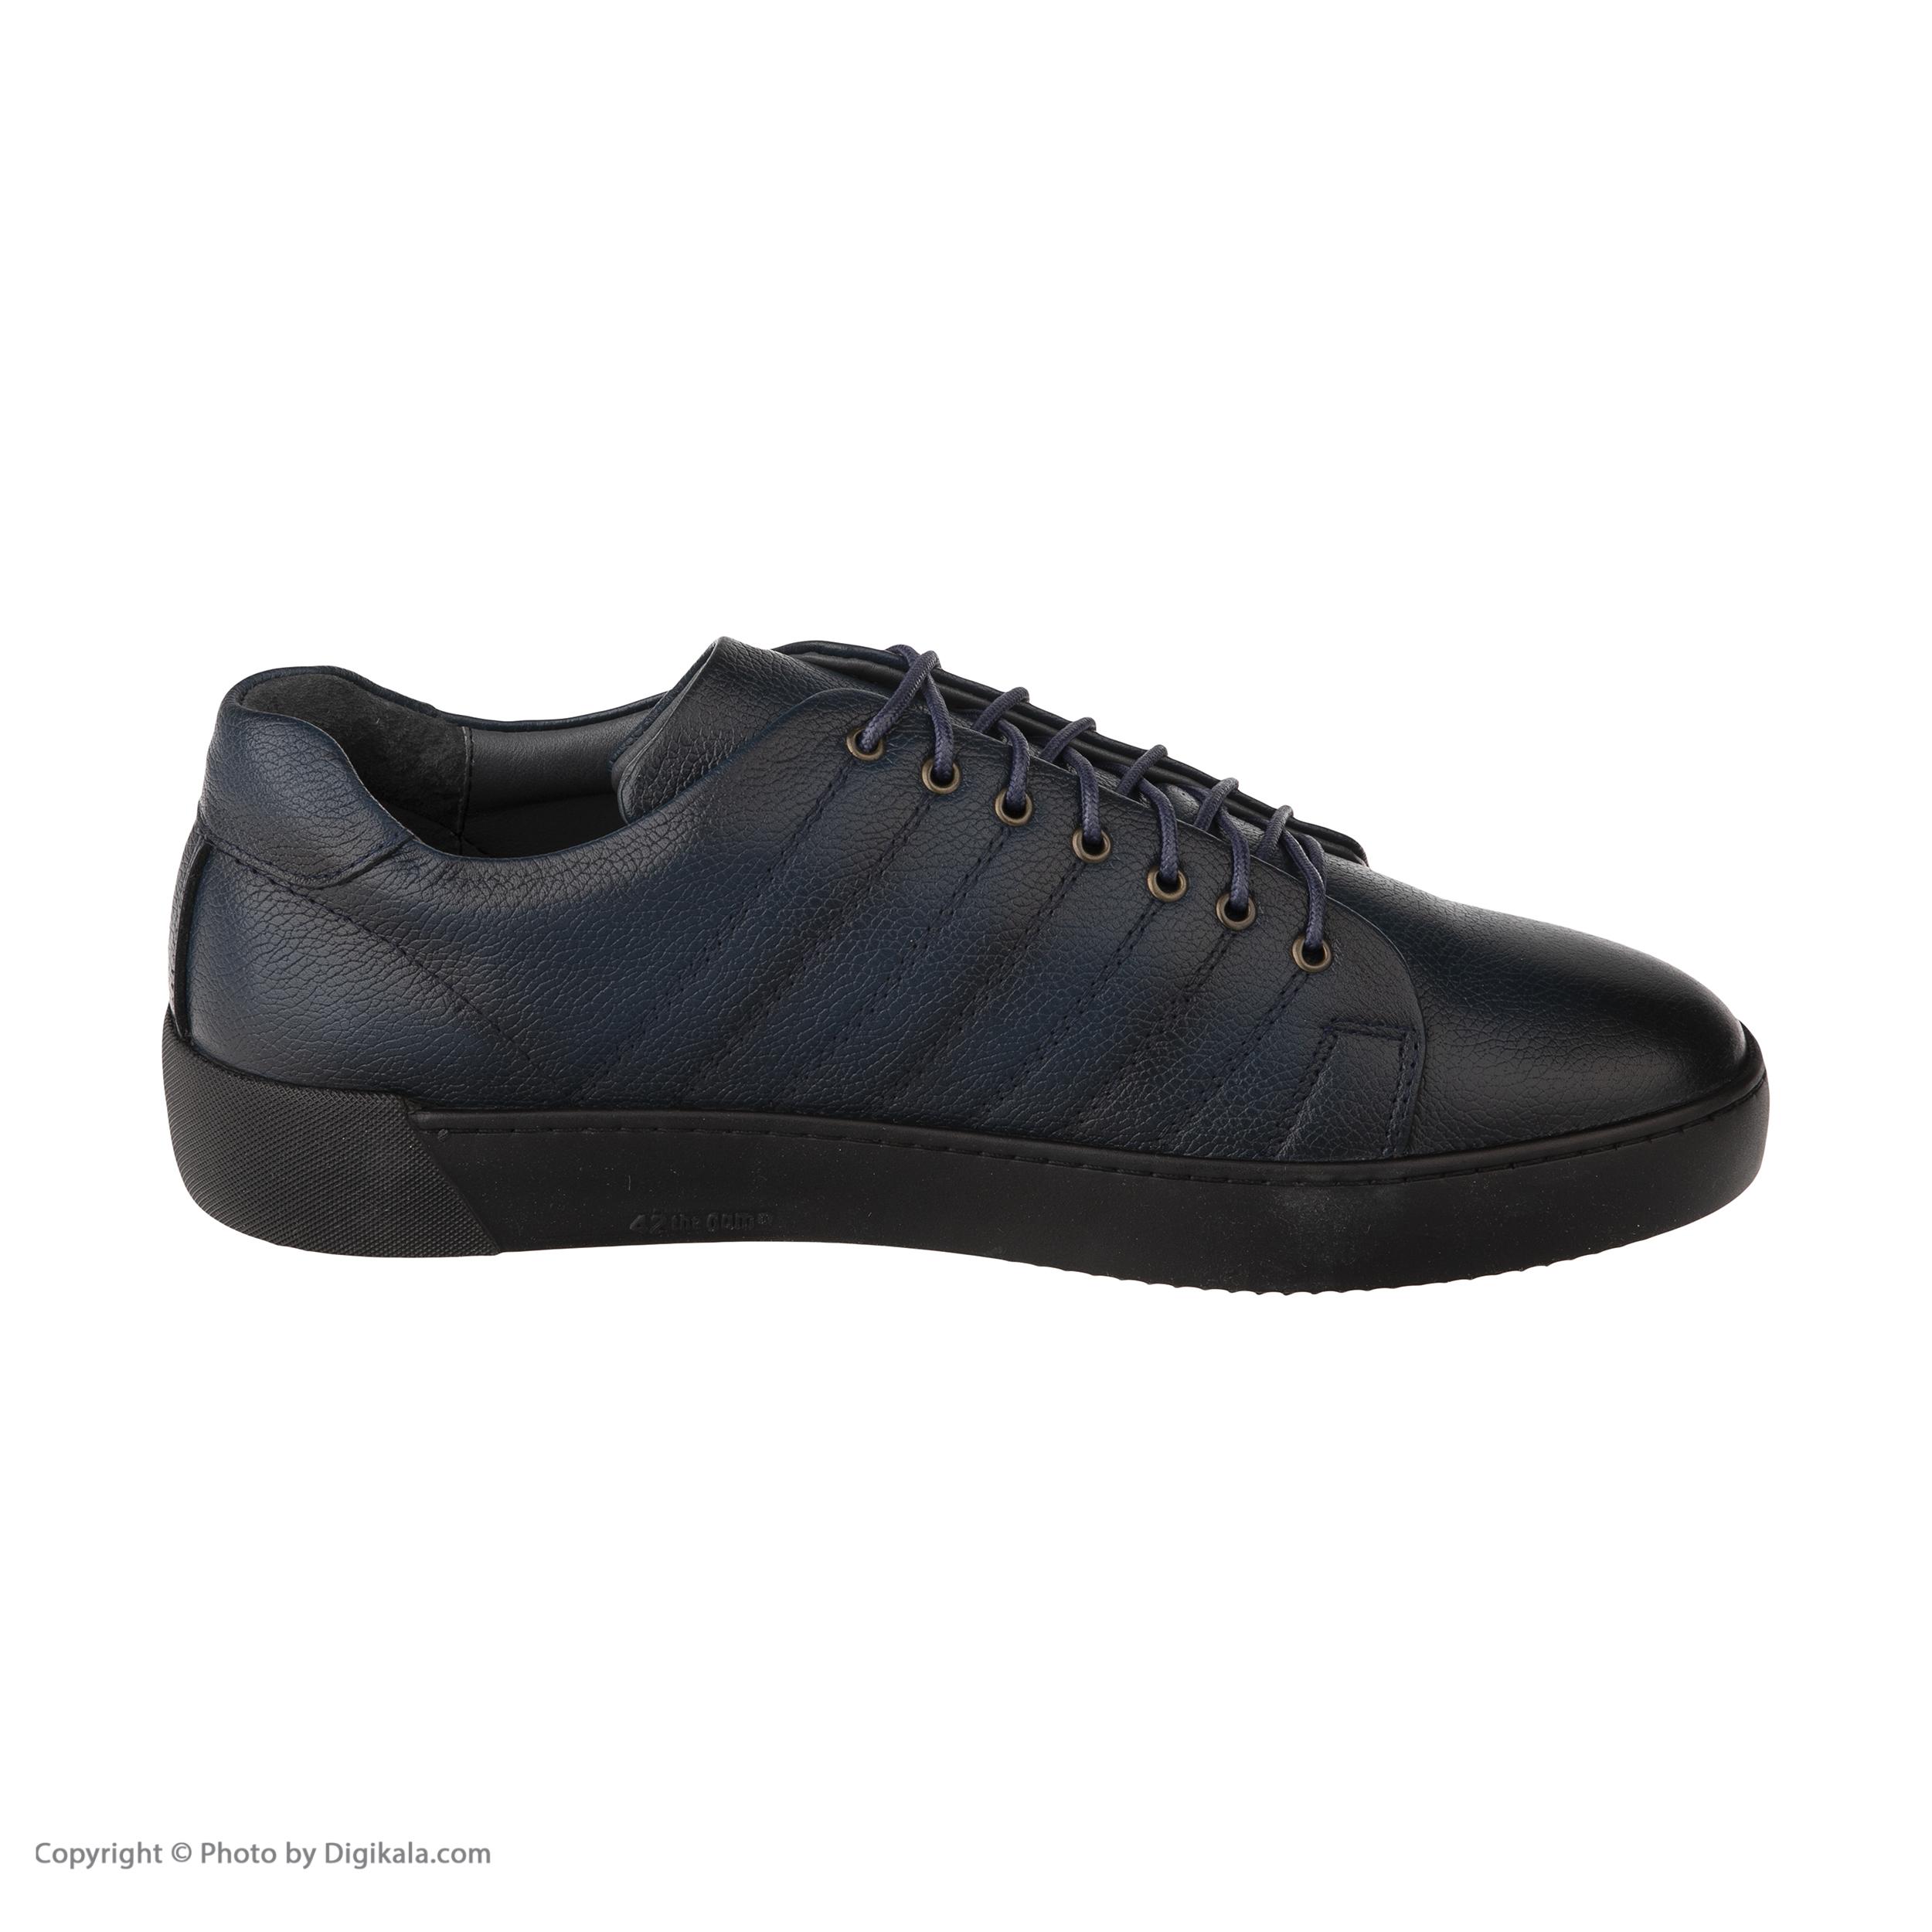 کفش روزمره مردانه شیفر مدل 7359A503103 -  - 5